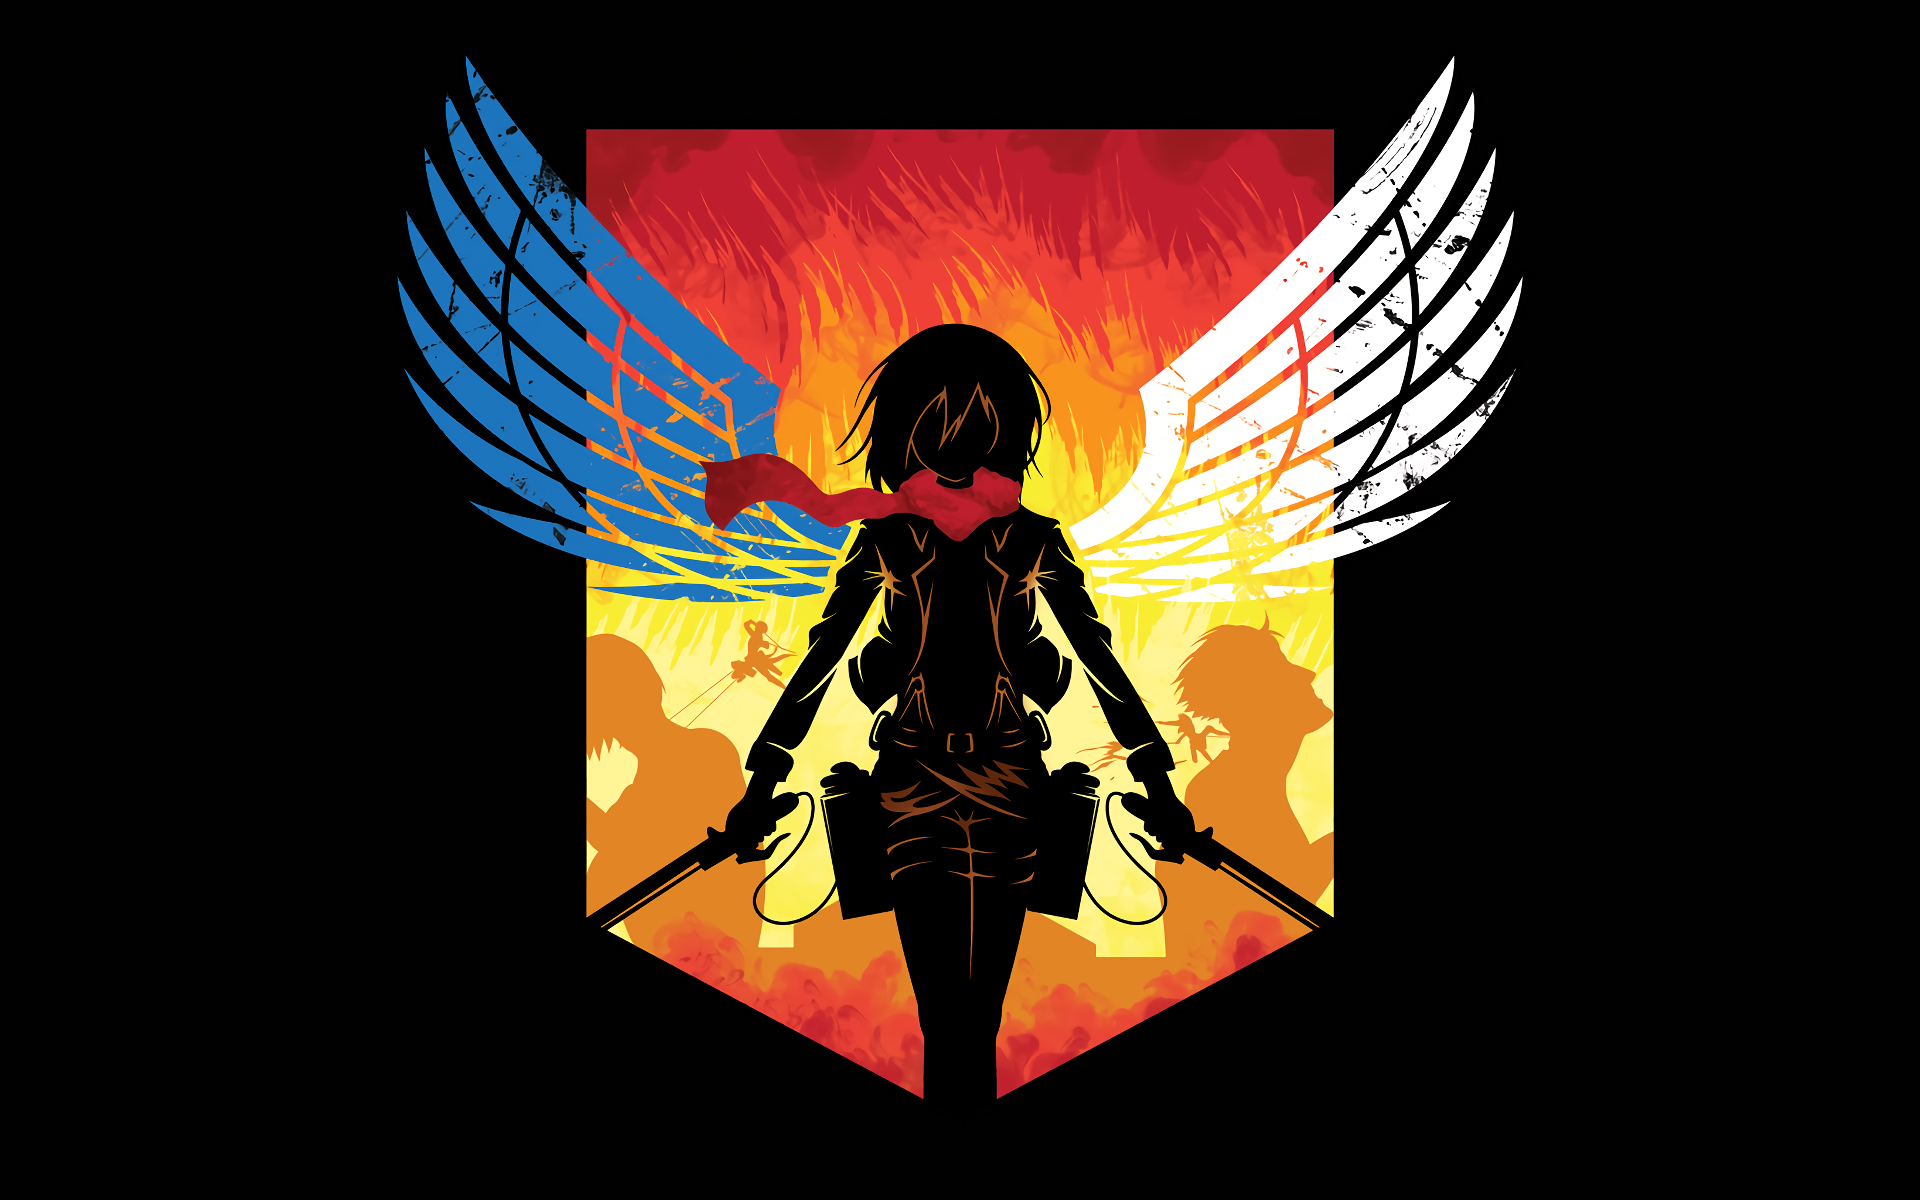 Anime 1920x1200 Shingeki no Kyojin Mikasa Ackerman logo Scout Regiment